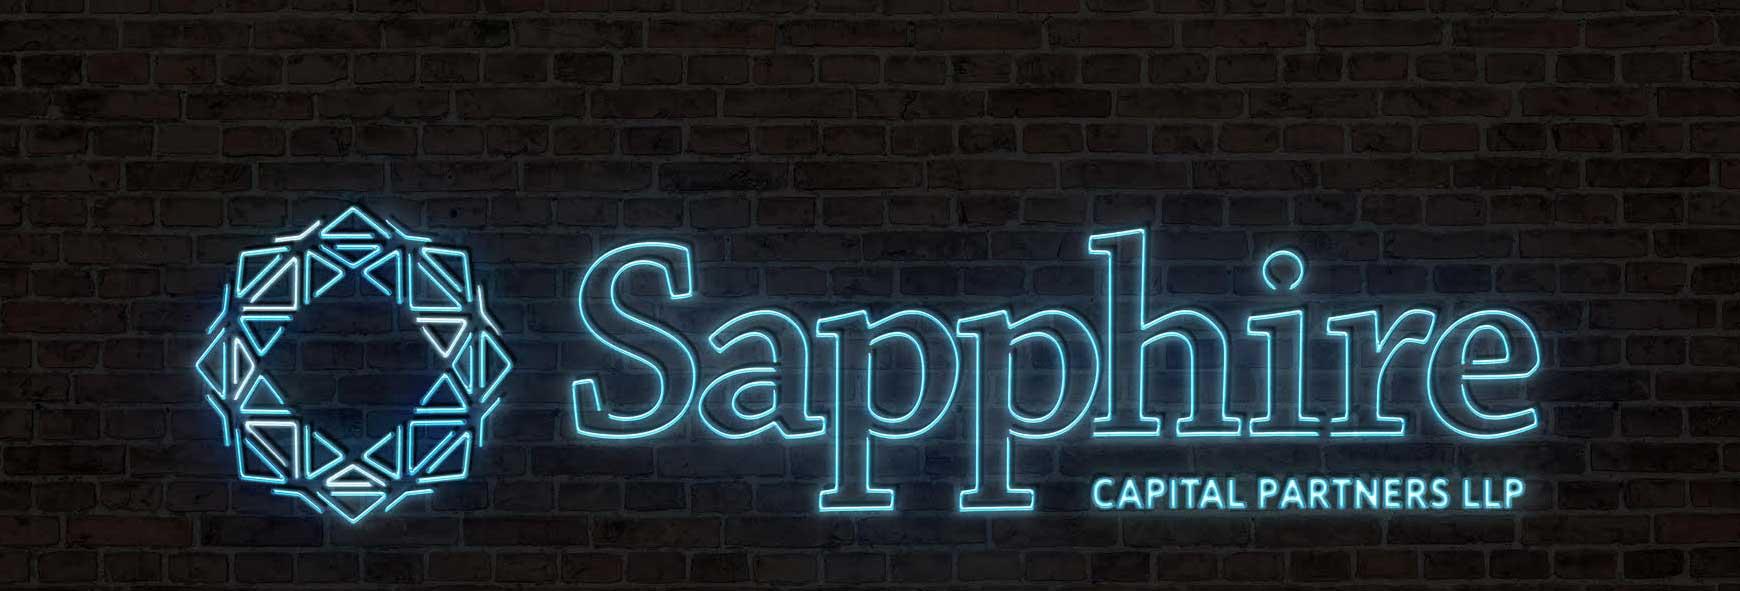 Sapphire Capital Partners LLP